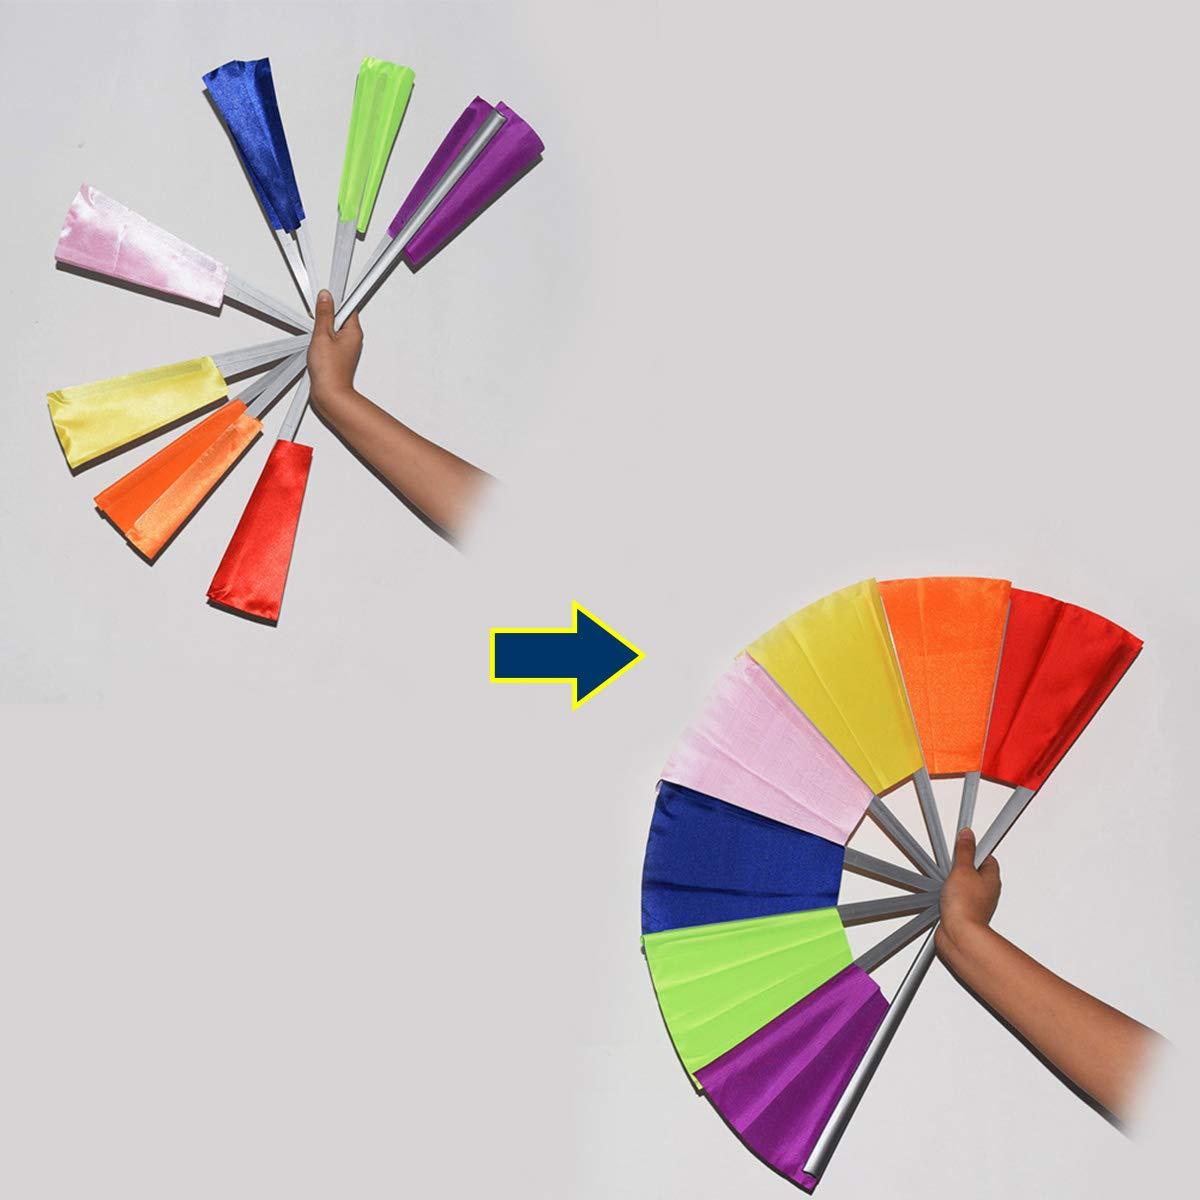 OUERMAMA Breakaway Fan Gimmick Magic Tricks Clown Comedic Folding Fan Props Multicolor Broken Fan Recovery & Restore Magic Prop Stage Magic Show Accessories for Kids and Adults